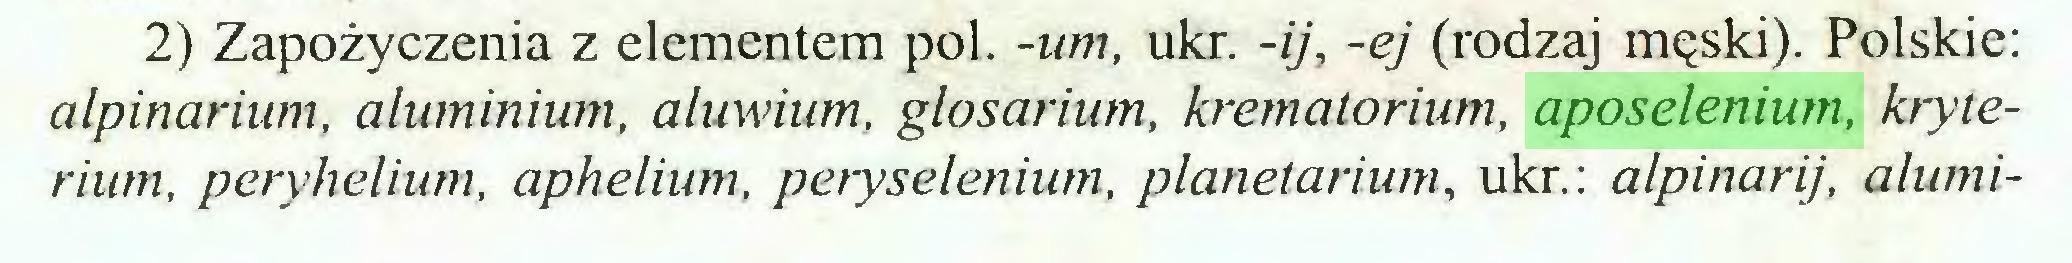 (...) 2) Zapożyczenia z elementem poi. -um, ukr. -ij, -ej (rodzaj męski). Polskie: alpinarium, aluminium, aluwium, glosarium, krematorium, aposelenium, kryterium, peryhelium, aphelium, peryselenium, planetarium, ukr.: alpinarij, alumi...